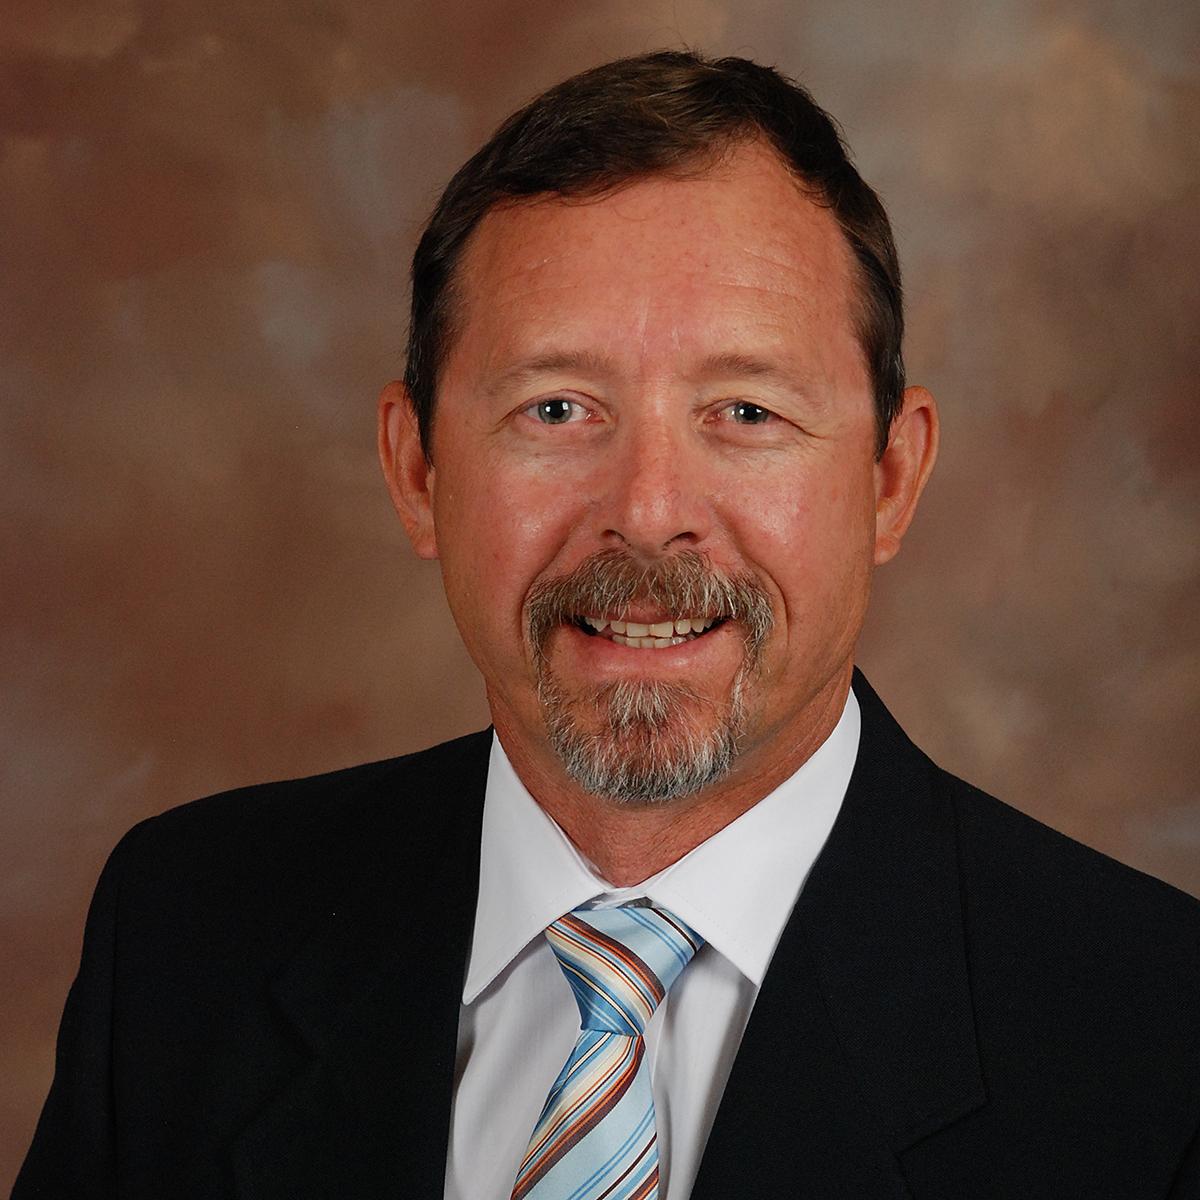 Profile picture of Rick Rasby